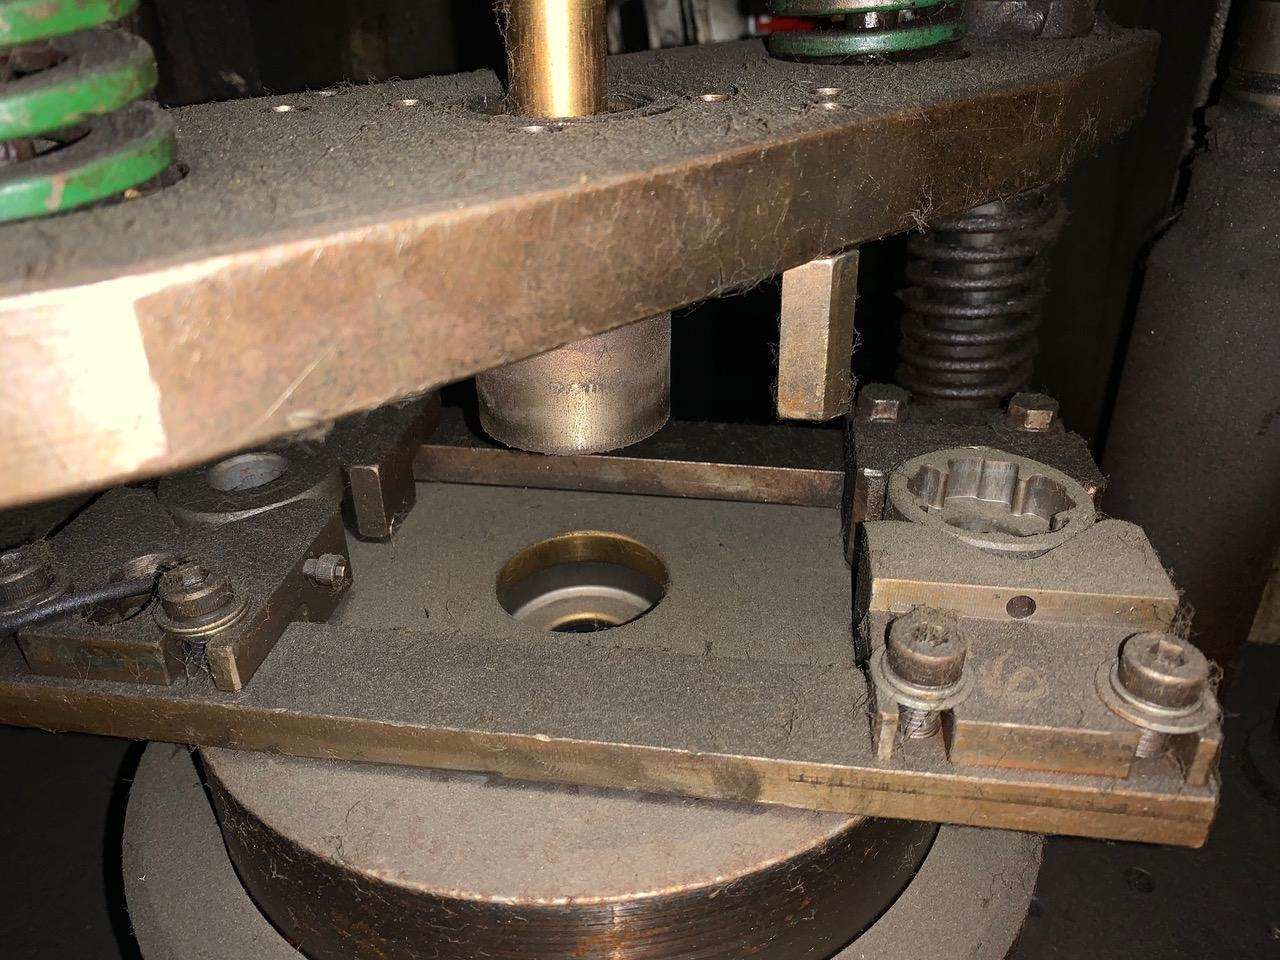 Aida Knuckle-Joint Press Model K-250 Machine